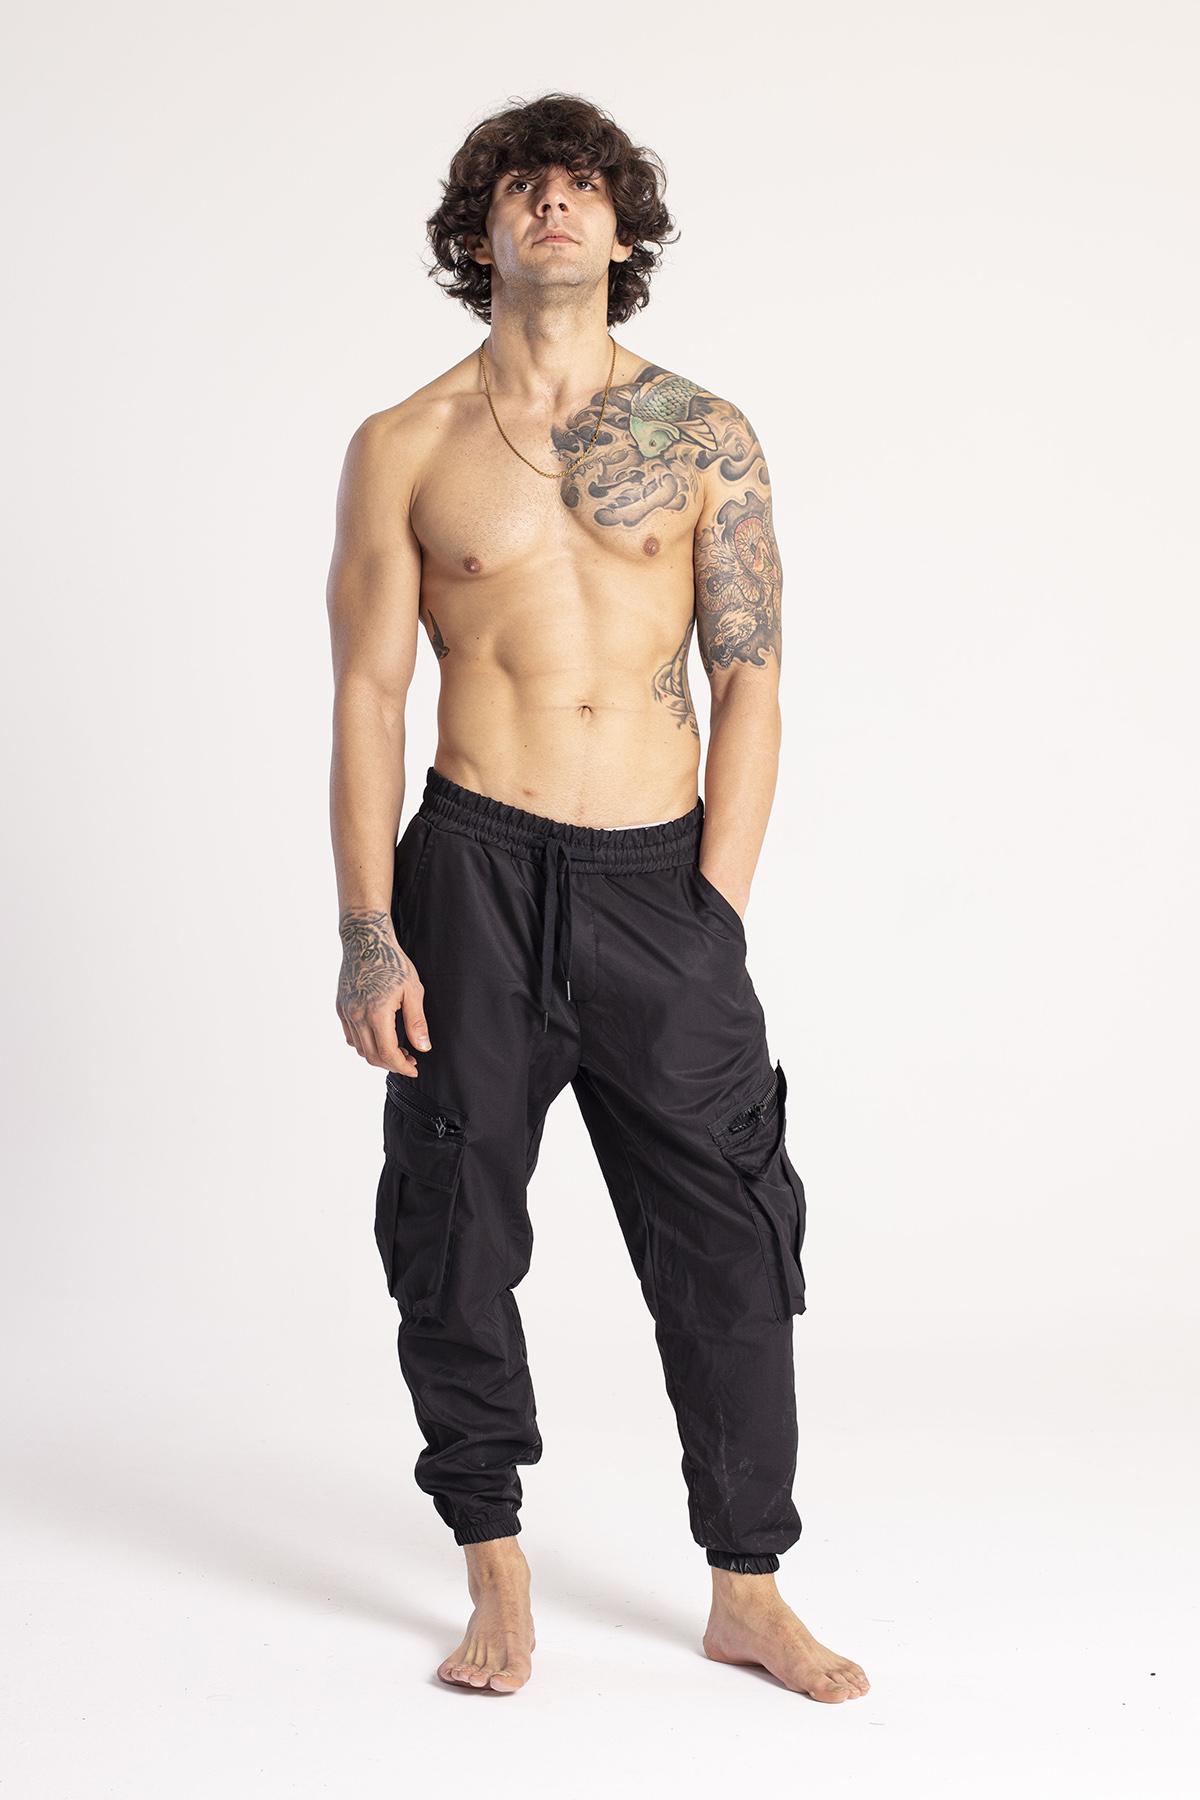 XHAN - Siyah Kargo Cep Jogger Pantolon 1KXE5-44673-02